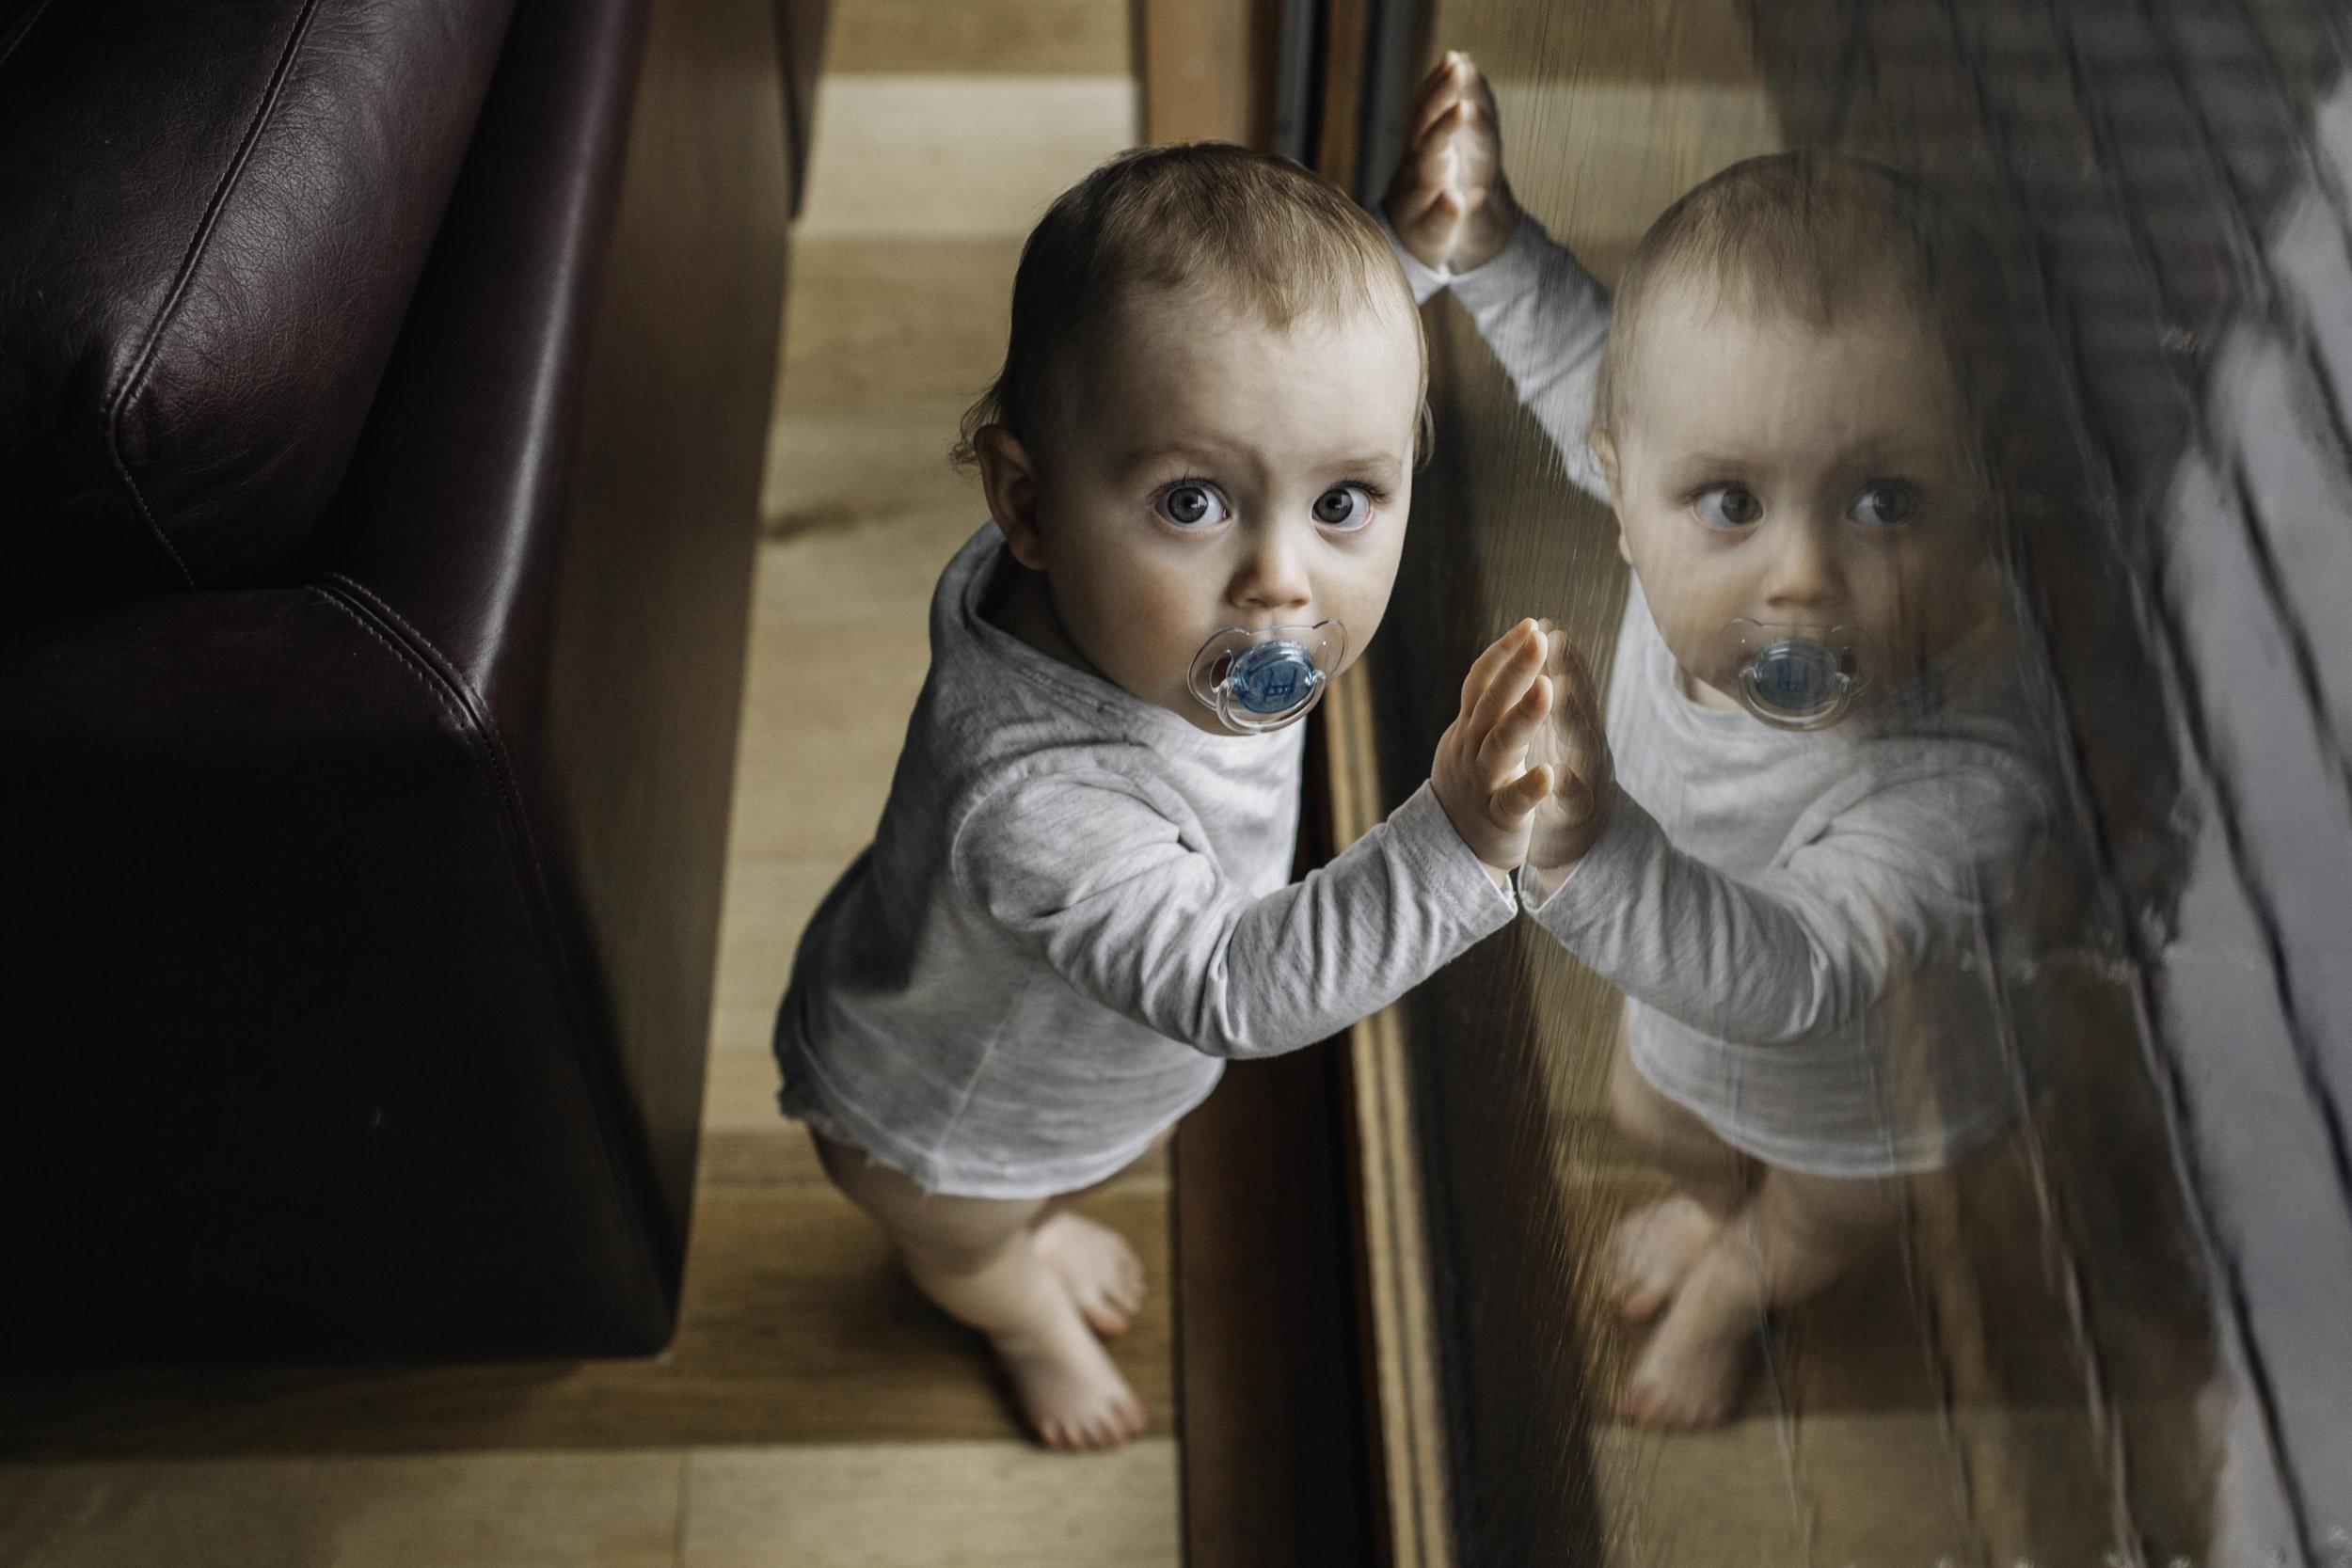 baby-behind-sofa.jpg